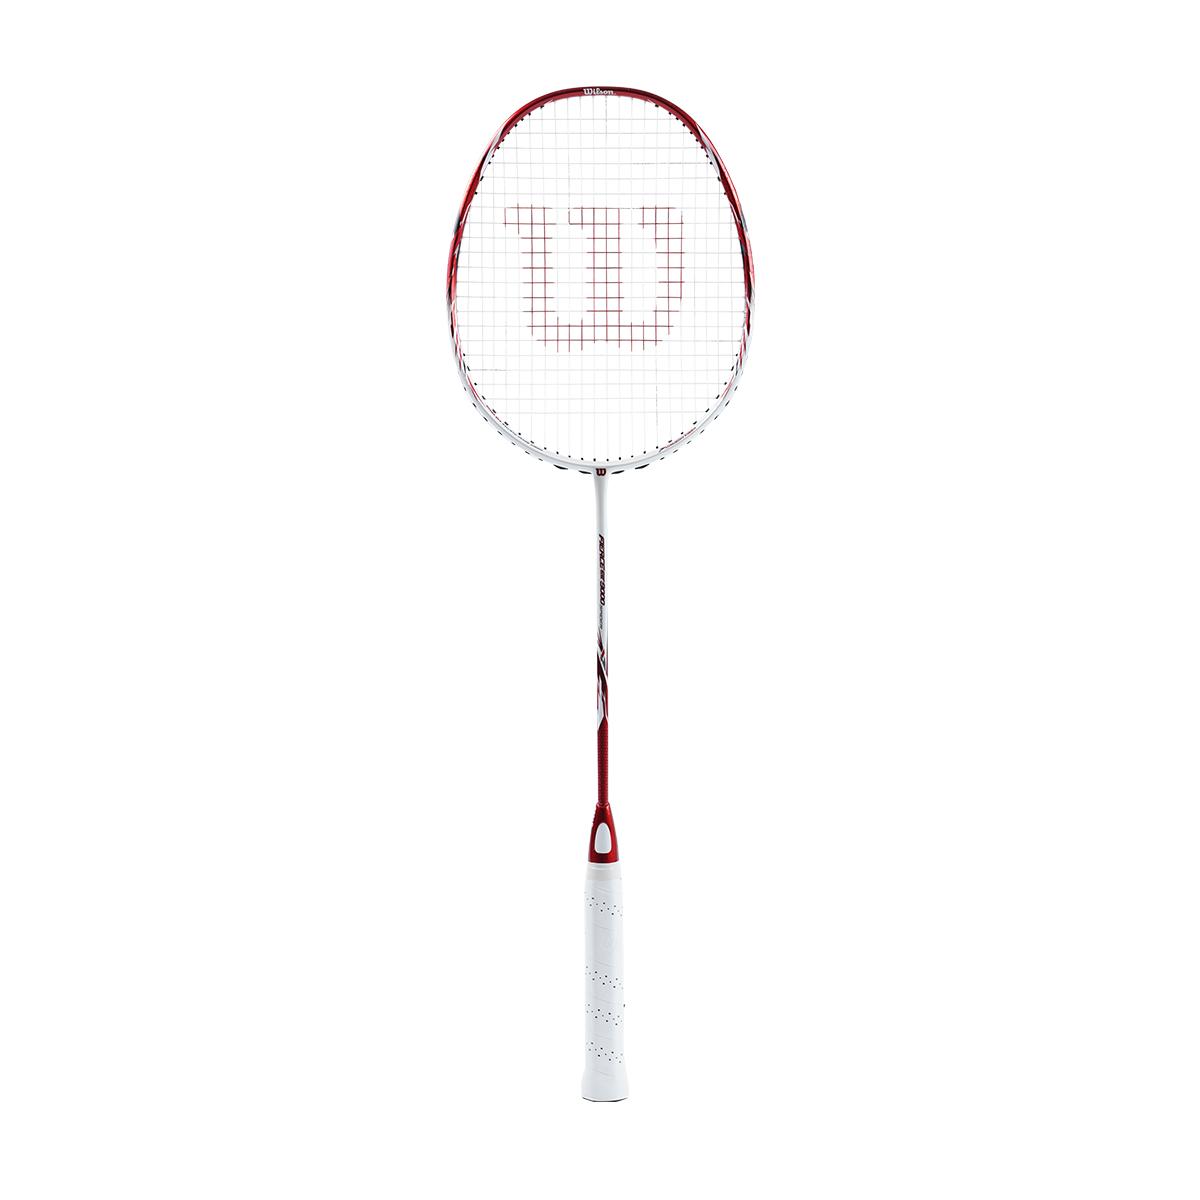 Wilson(ウイルソン) バドミントンラケット(フレームのみ) FIERCE CX9000 SPIDER WRT8865202